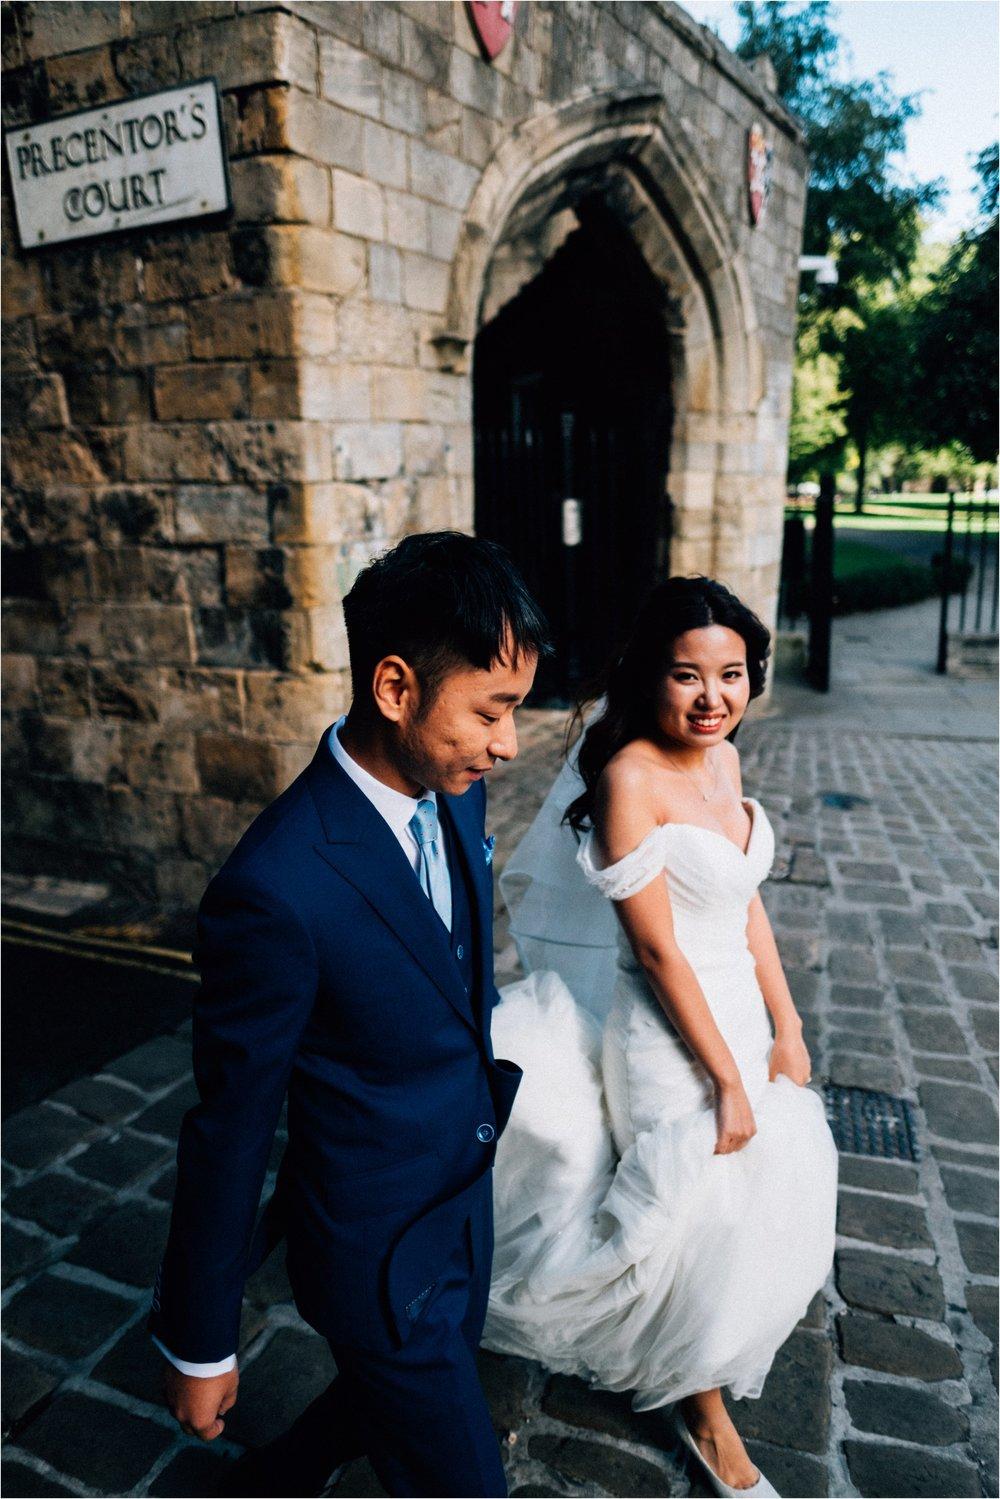 York city elopement wedding photographer_0101.jpg